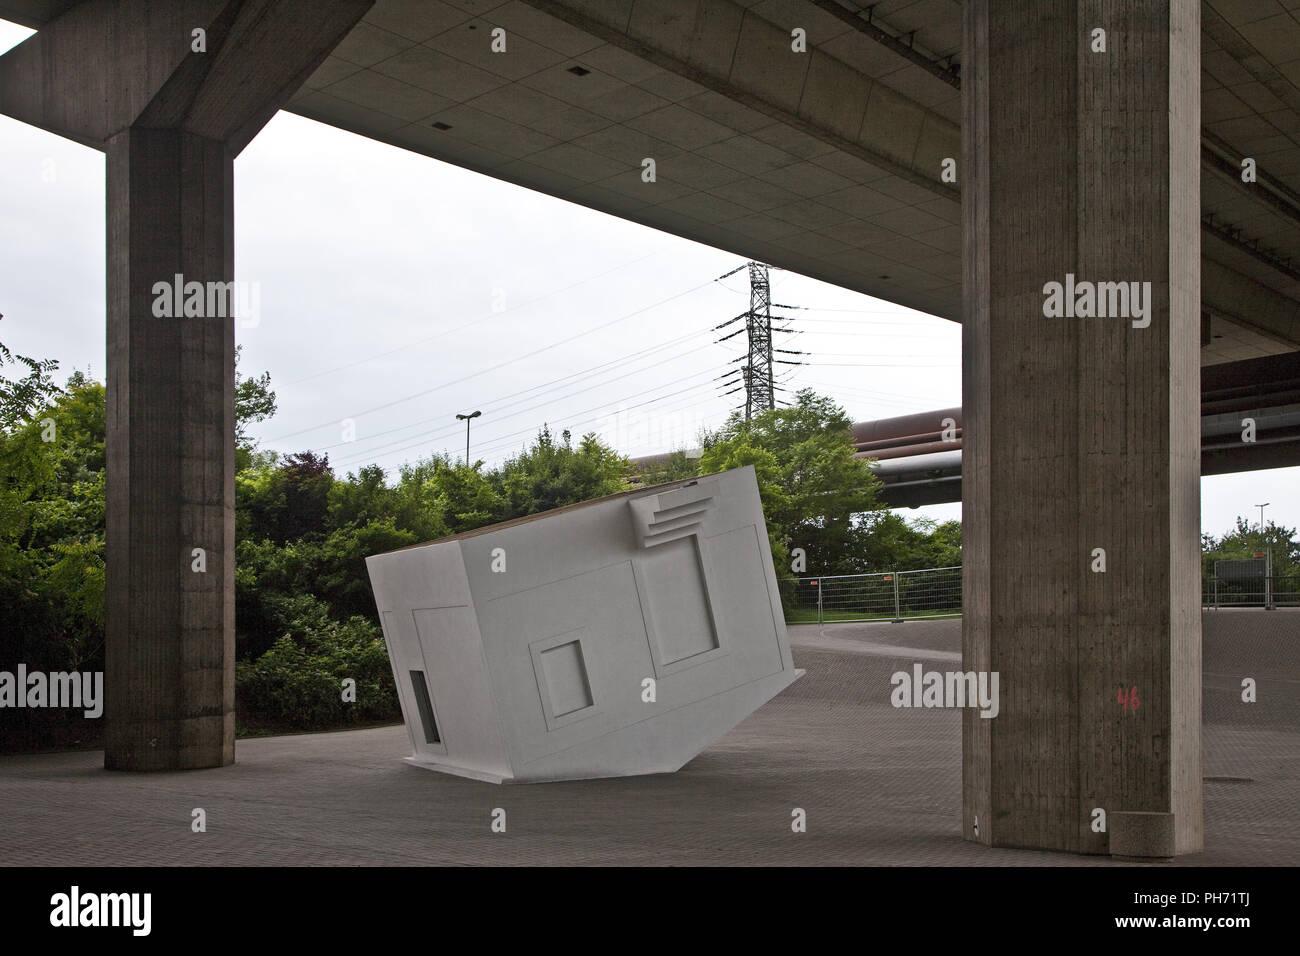 Artwork Vertigo, Emscherkunst, Duisburg, Germany. - Stock Image